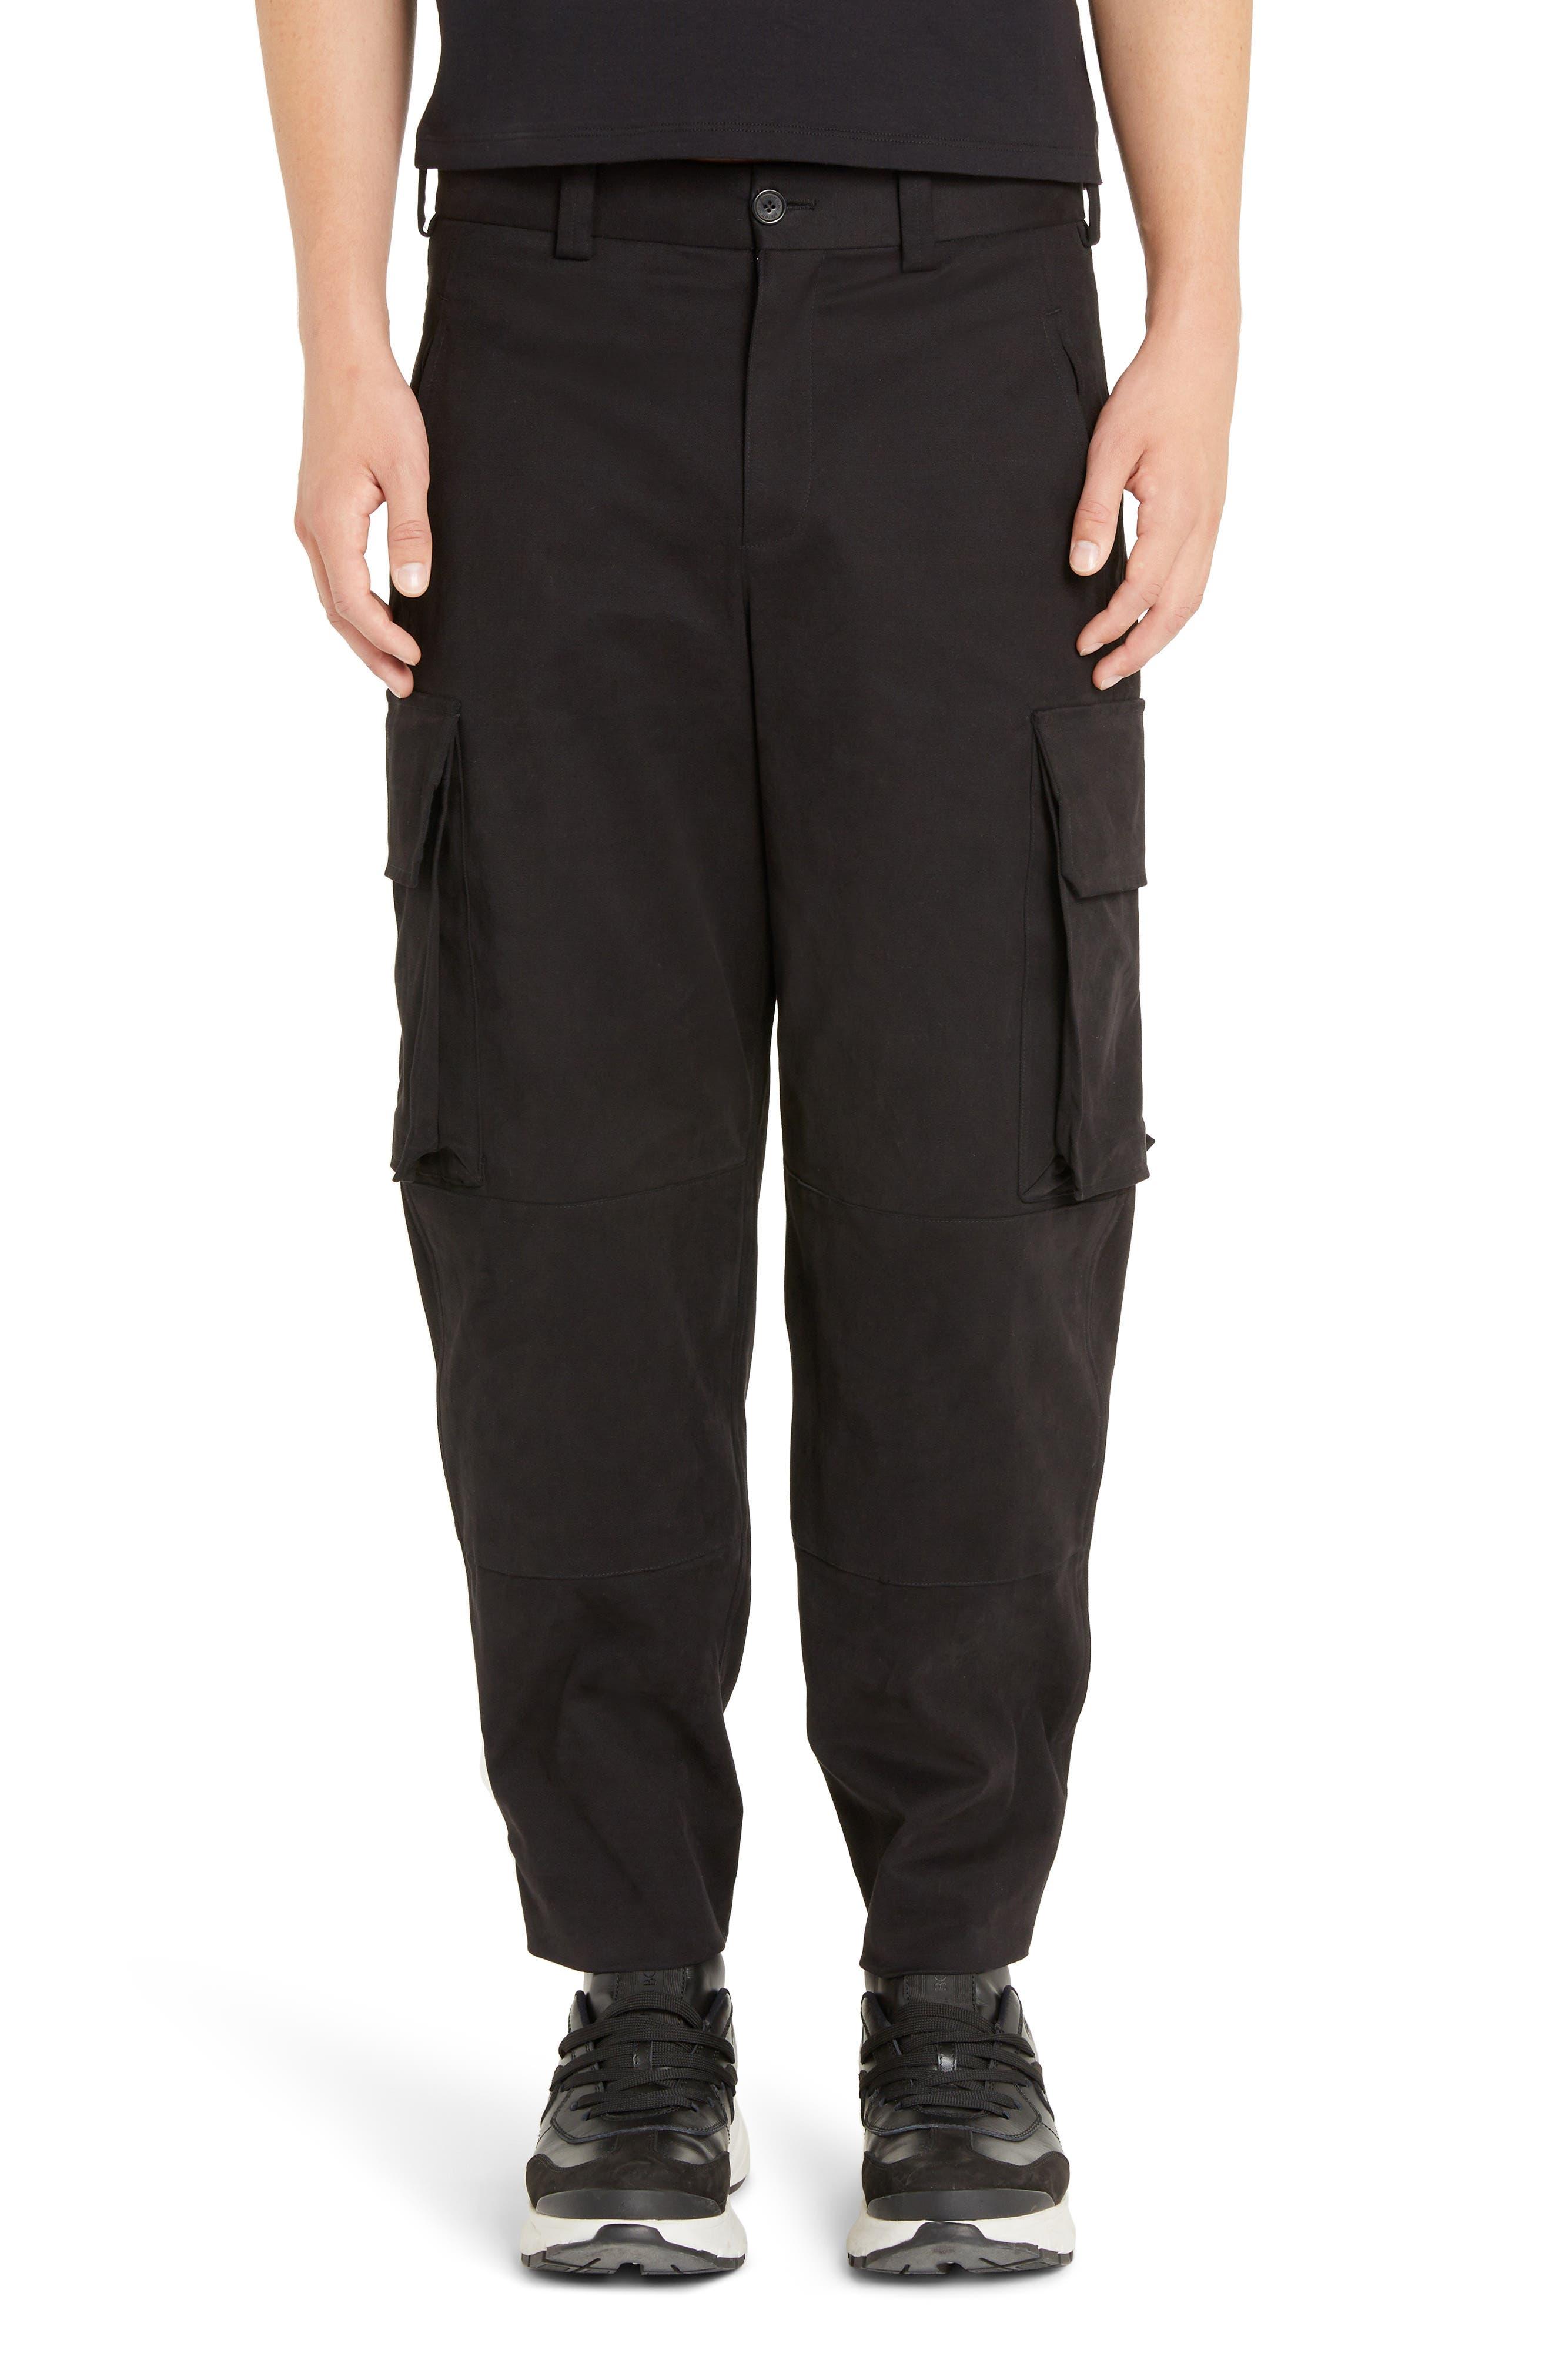 Neil Barrett Cargo Pants, Black